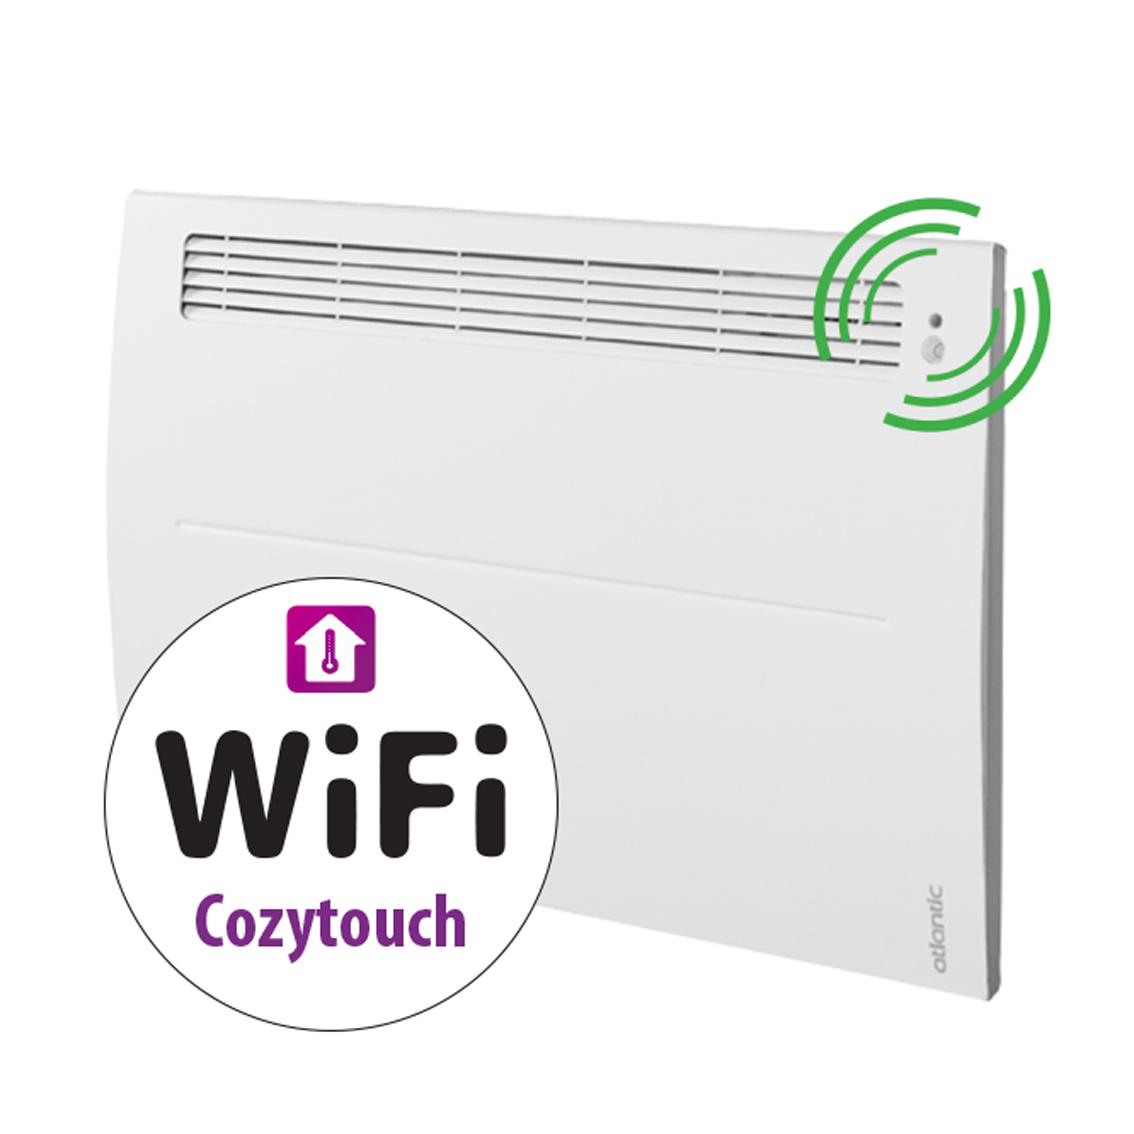 Konvektor Altis Ecoboost + WiFi 2000W Atlantik Elektro Vukojevic